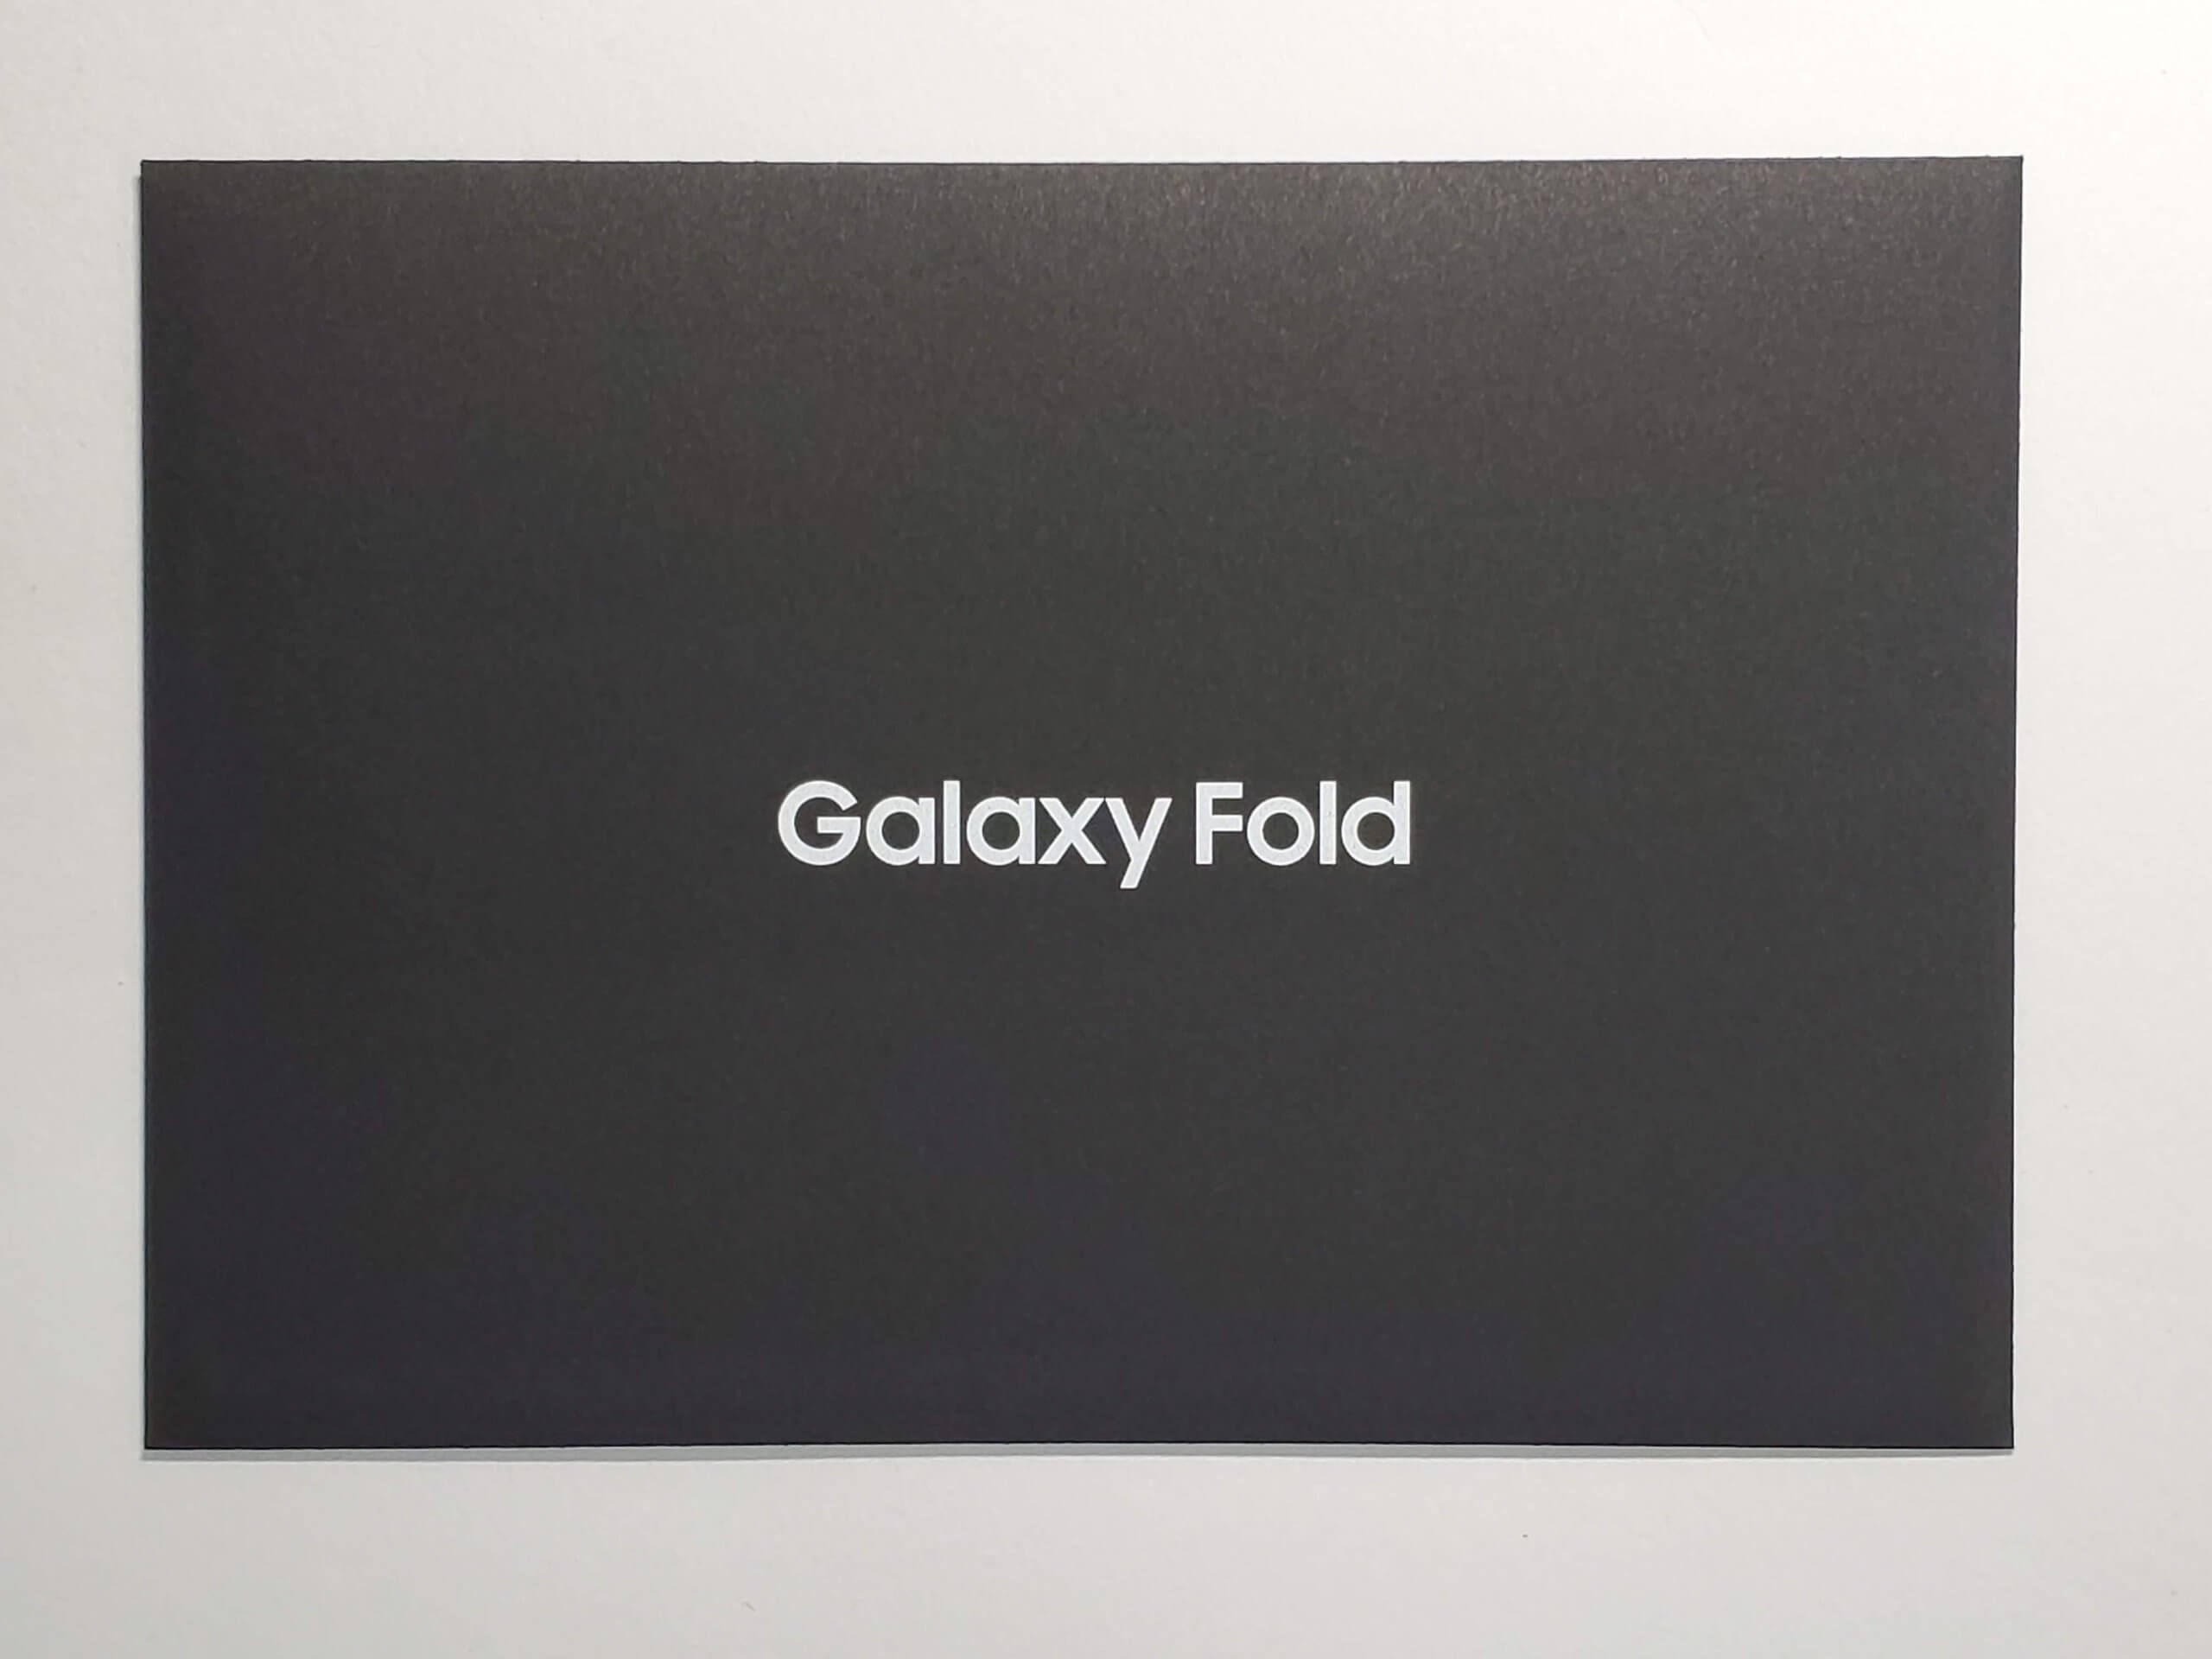 Galaxy Fold からの『ラブレター』